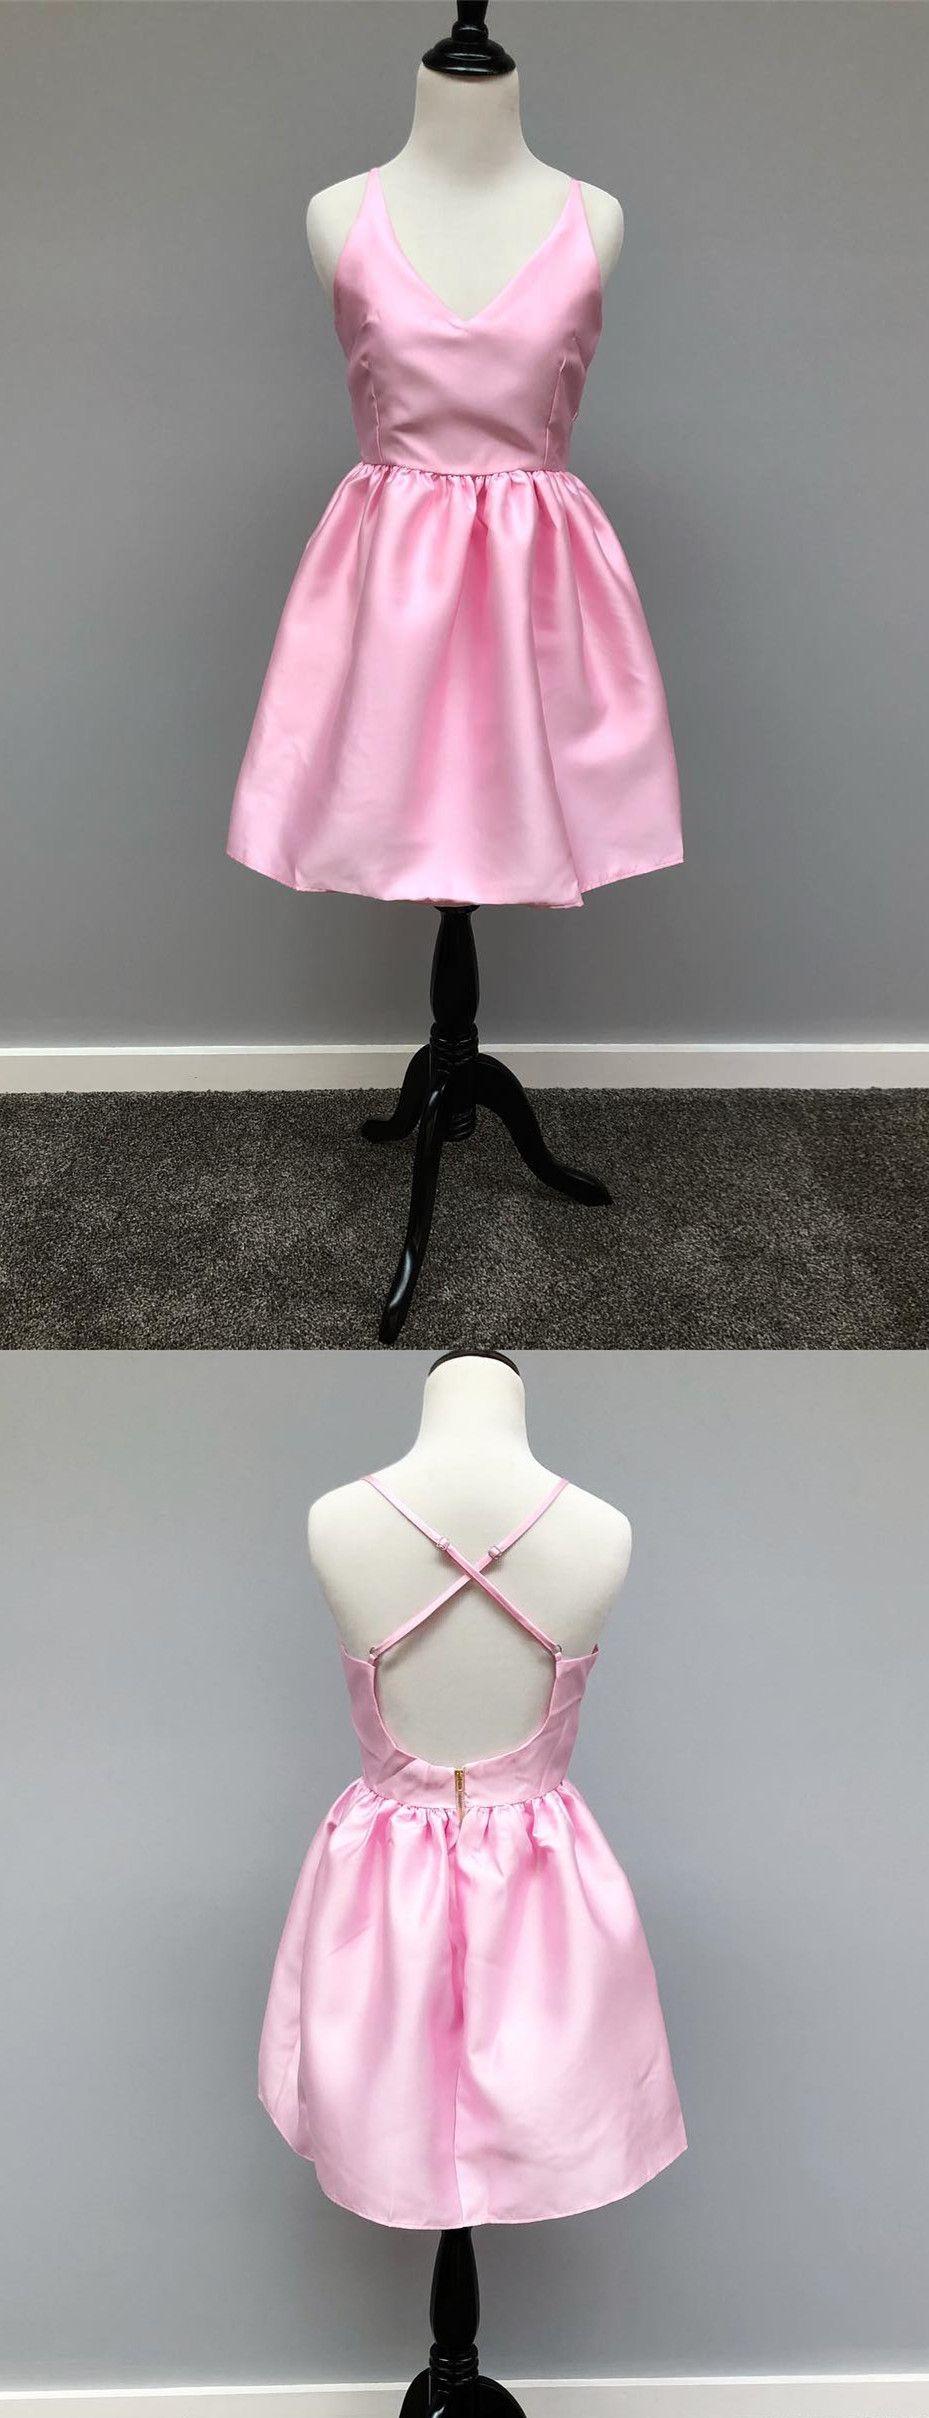 Simple Short A-line Navy Blue Homecoming Dress with Criss Cross Back #navyblueshortdress